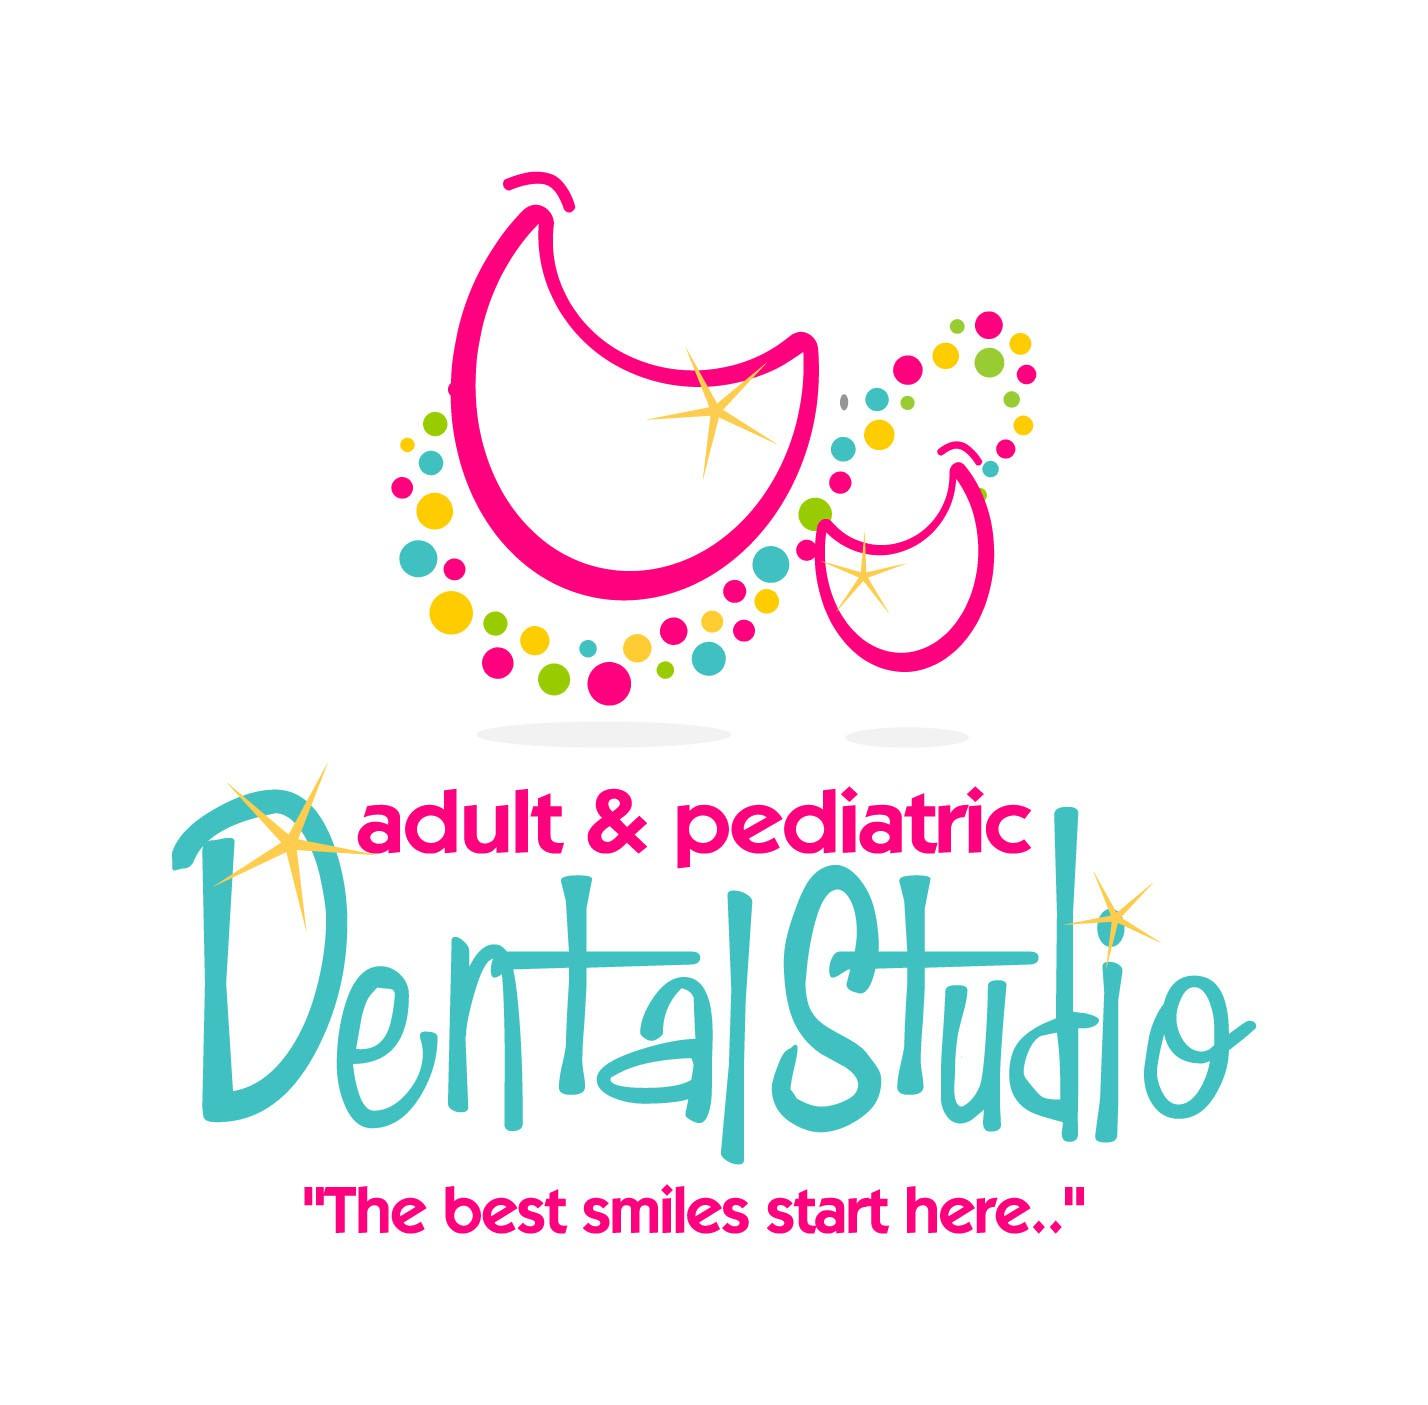 New logo wanted for Adult & Pediatric Dental Studio